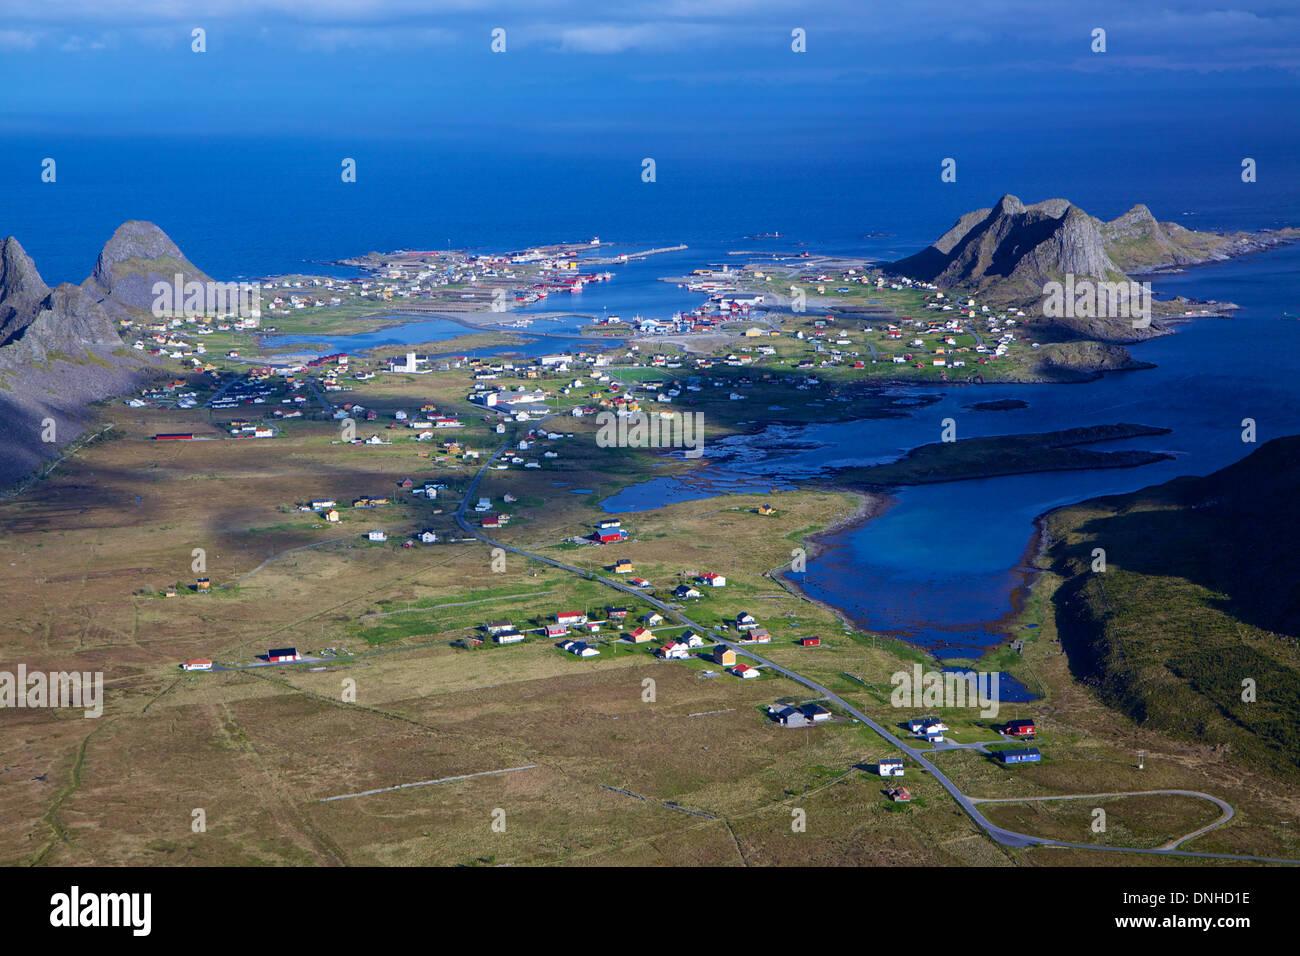 Aerial view of norwegian fishing town of Sorland on island Vaeroy, Lofoten islands - Stock Image